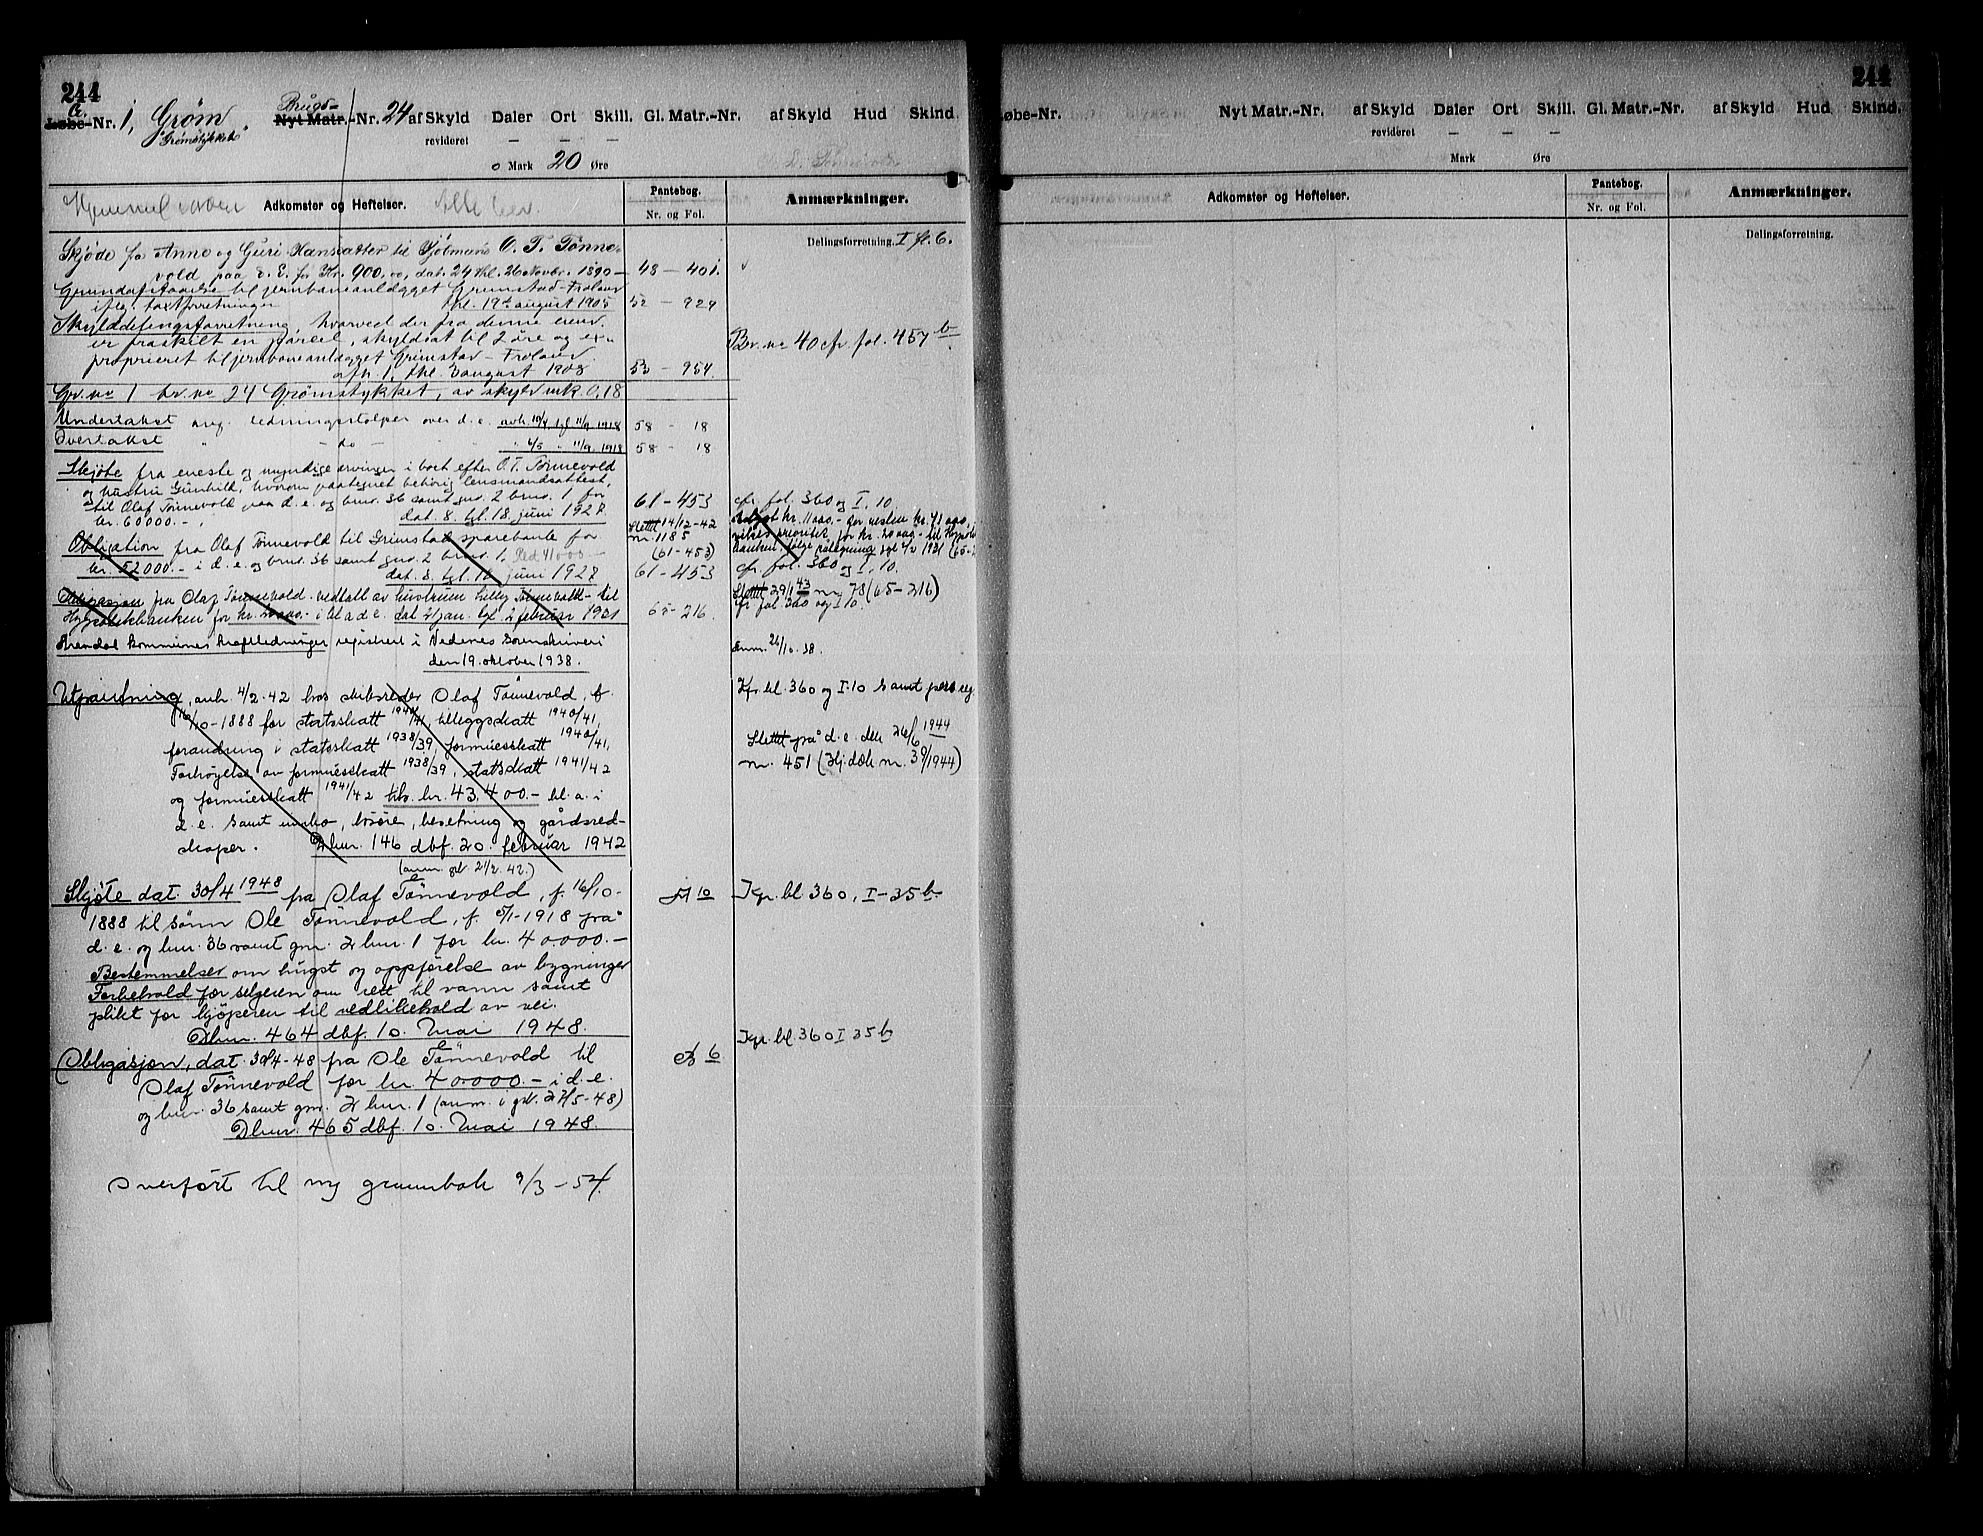 SAK, Vestre Nedenes/Sand sorenskriveri, G/Ga/L0018: Panteregister nr. 13b, 1872-1956, s. 244